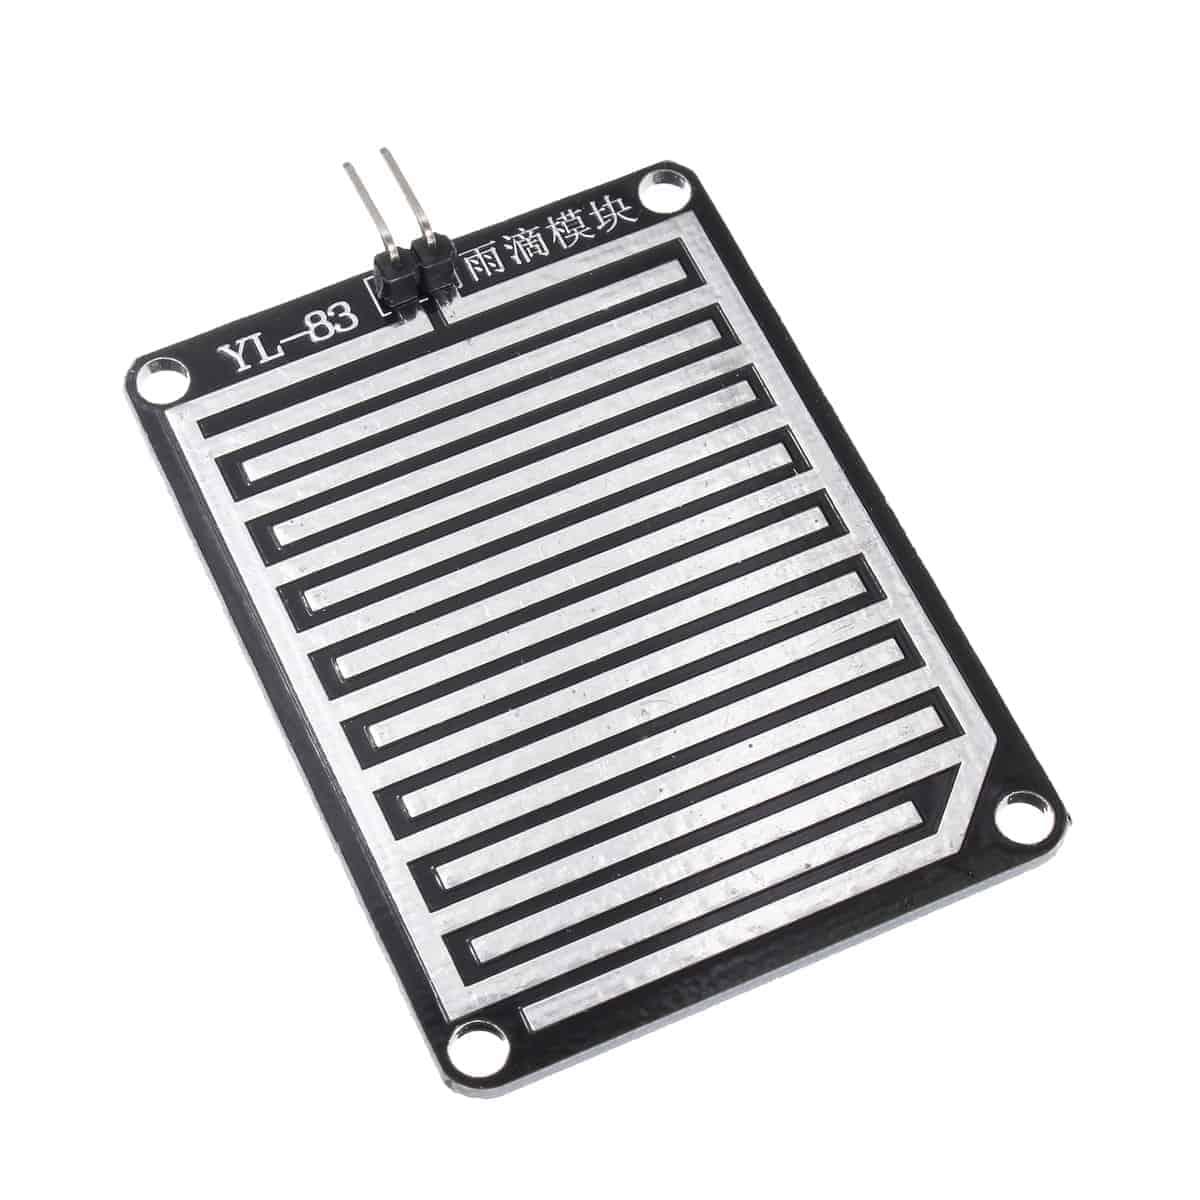 Raindrop Detection Sensor Module Humidity Rain Drop For Arduino PI #5E5E6D